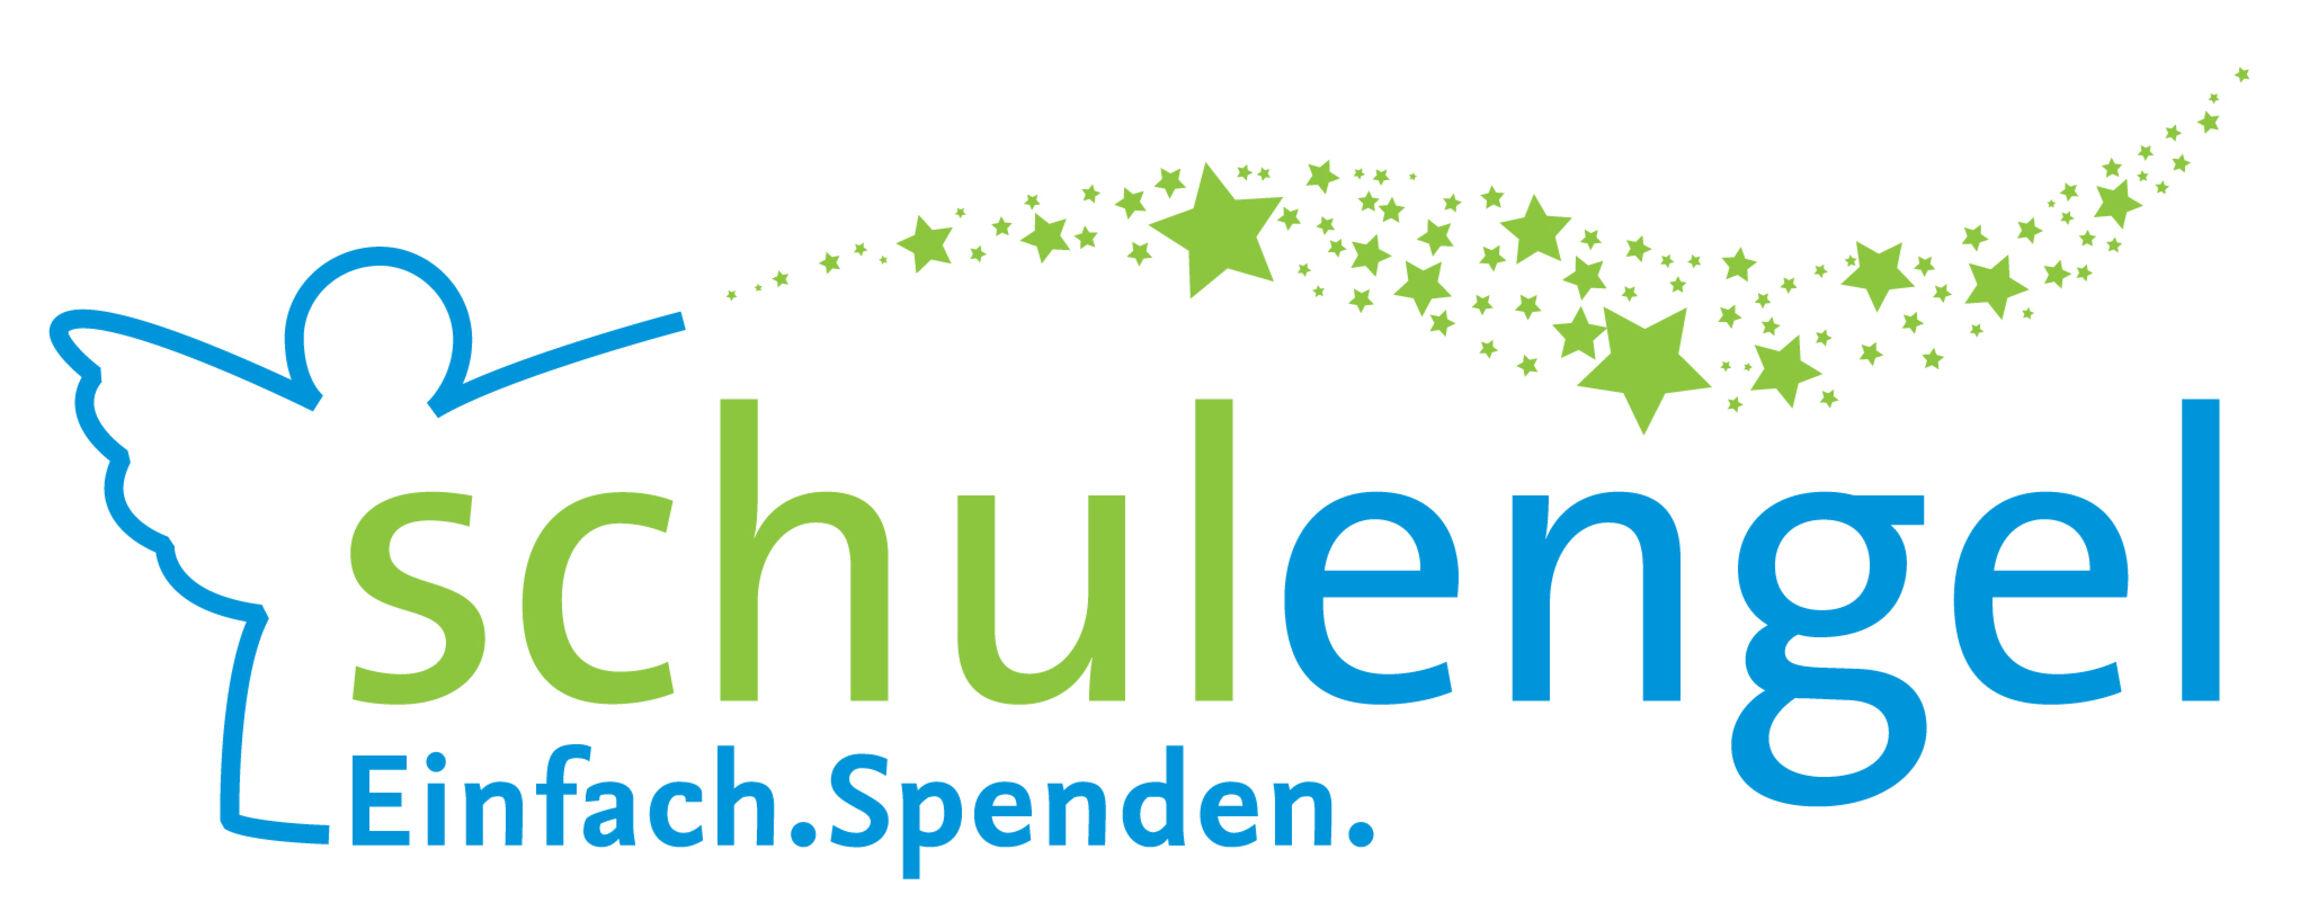 Schulengel-Logo-JPG